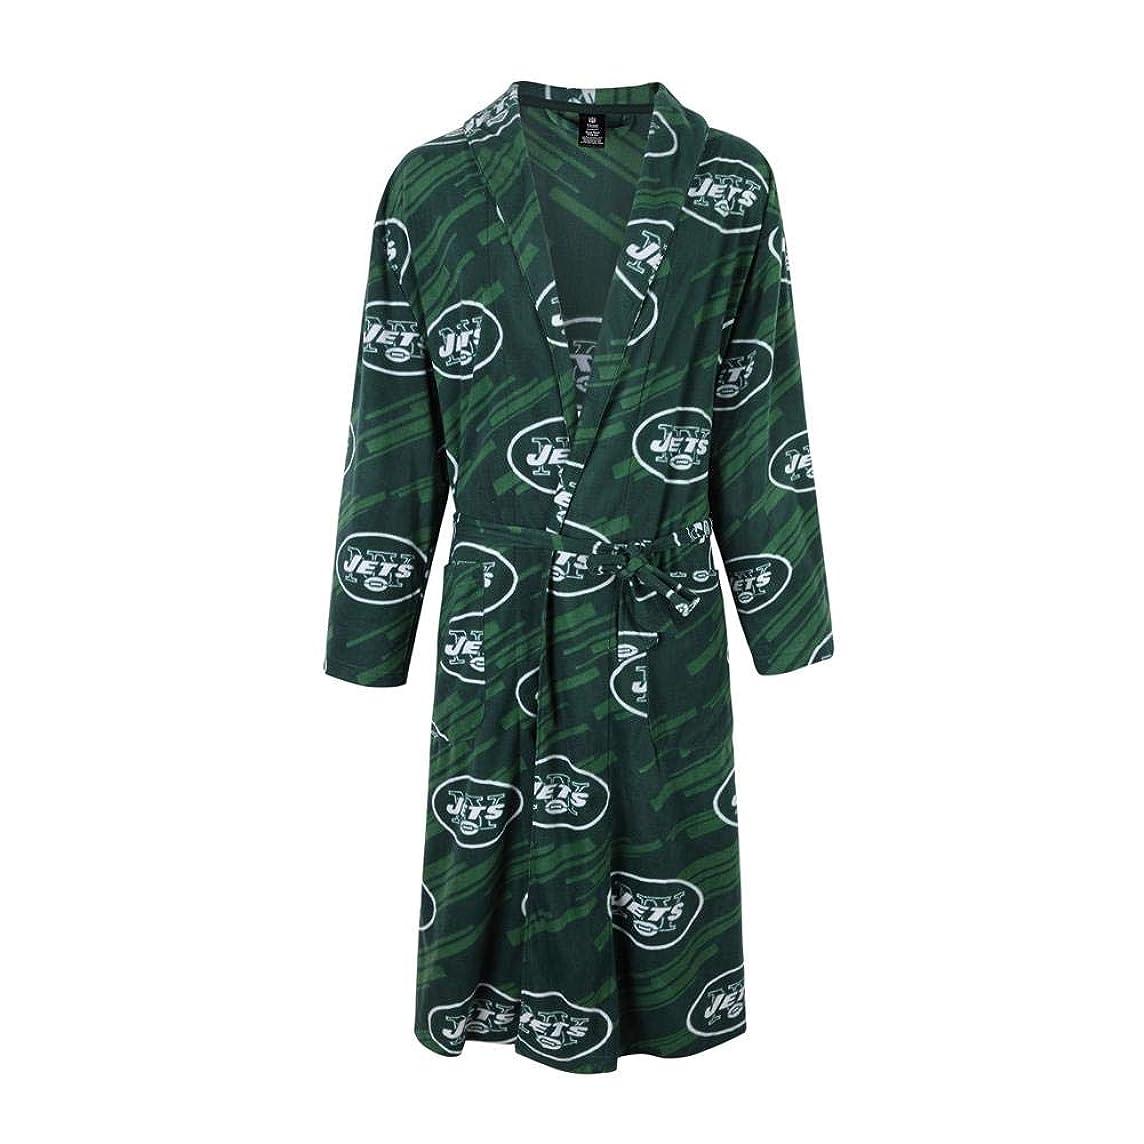 Concepts Sport Men's New York Jets Super Soft Fleece Robe